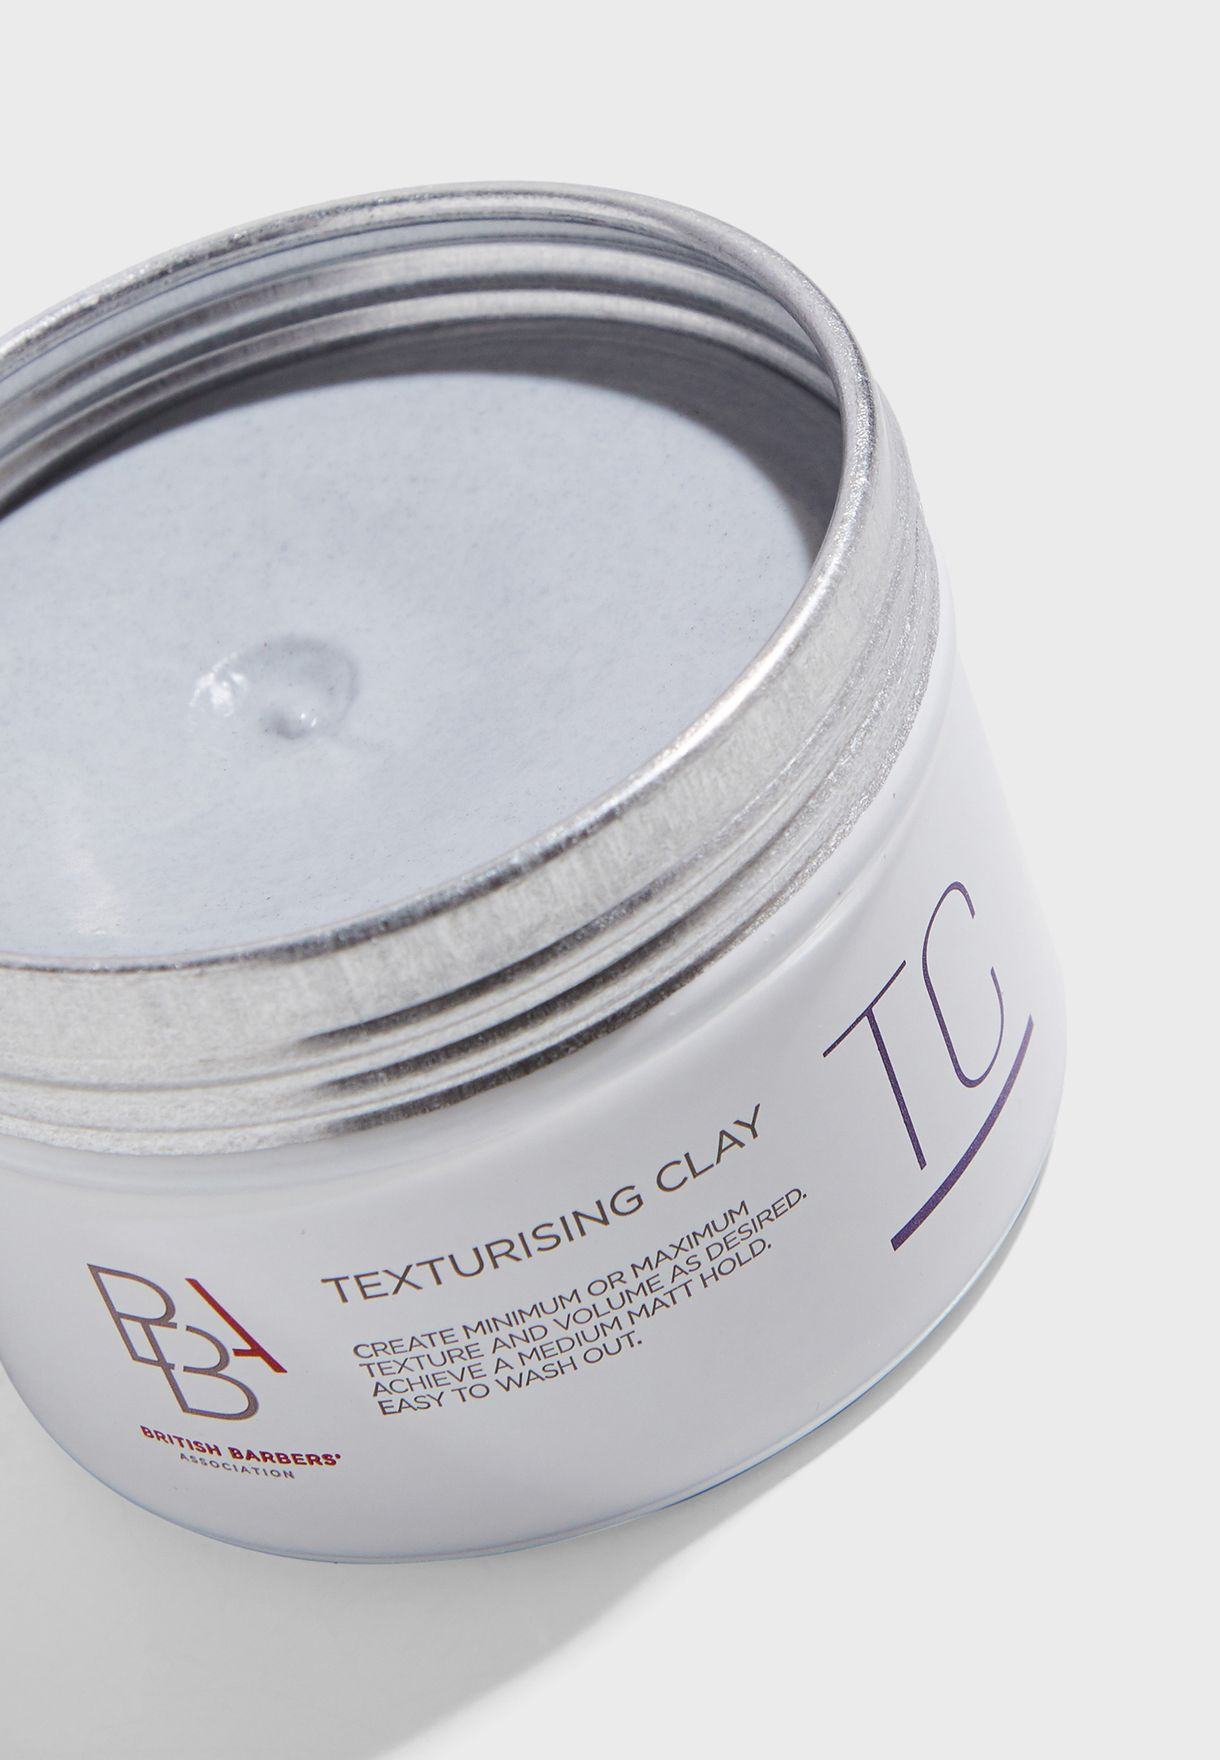 Texturising Clay